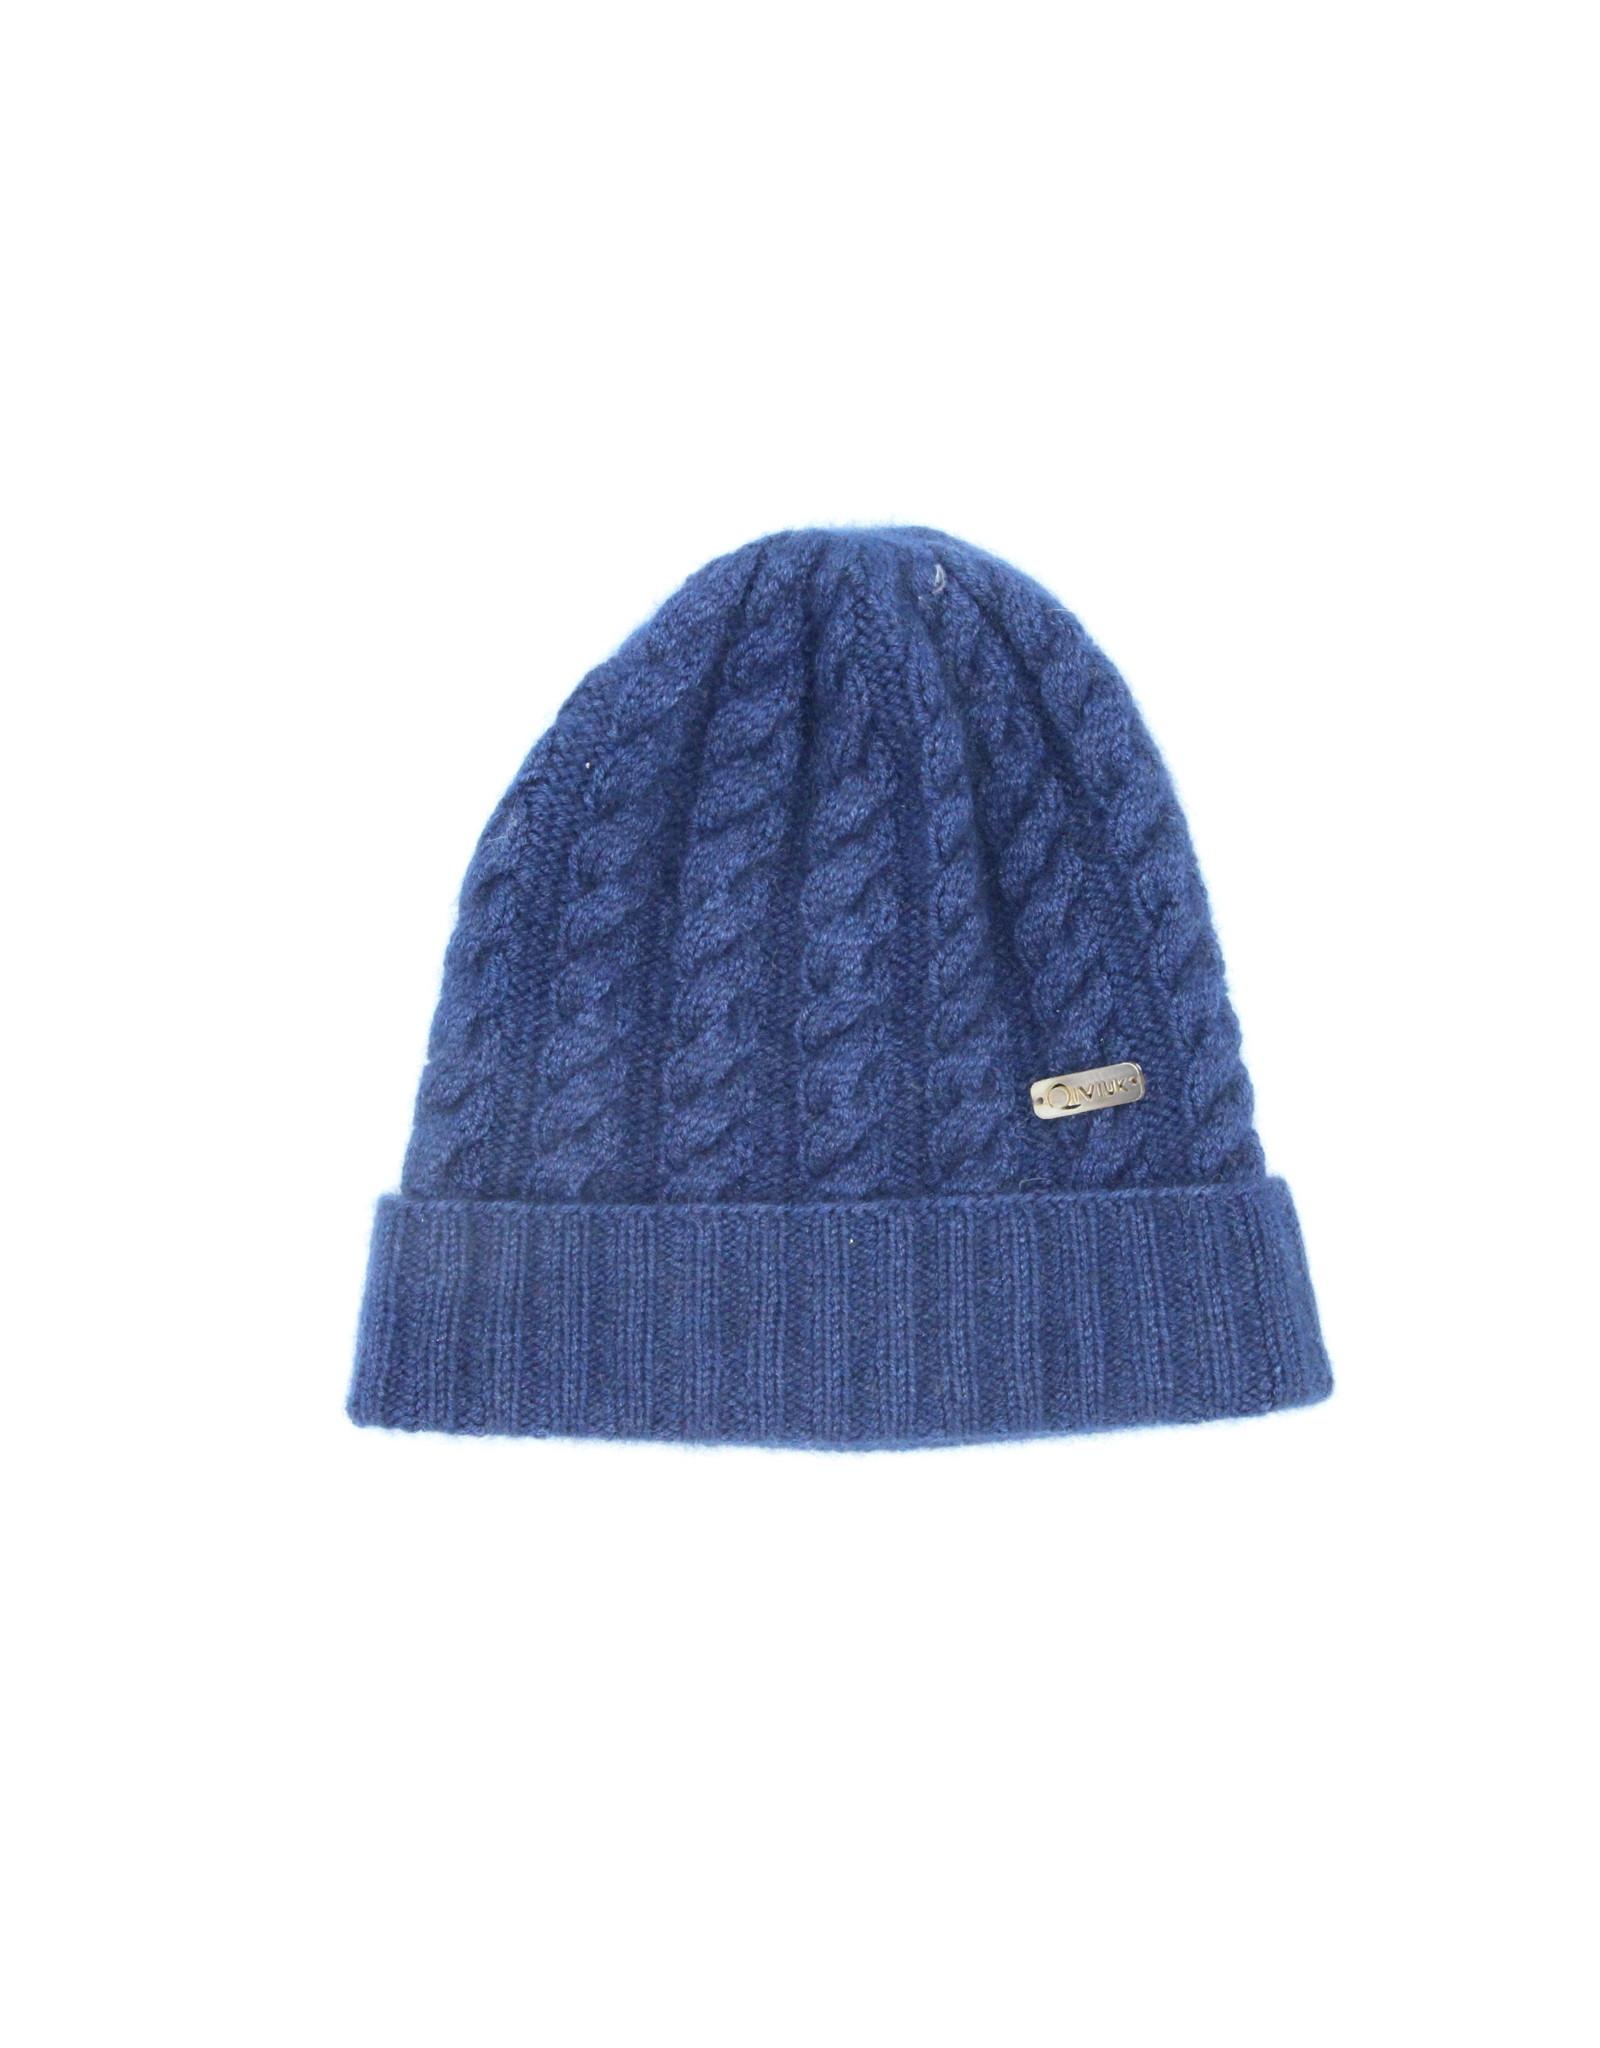 Cable Hat - 45% Qiviuk 45% Merino 10% Silk